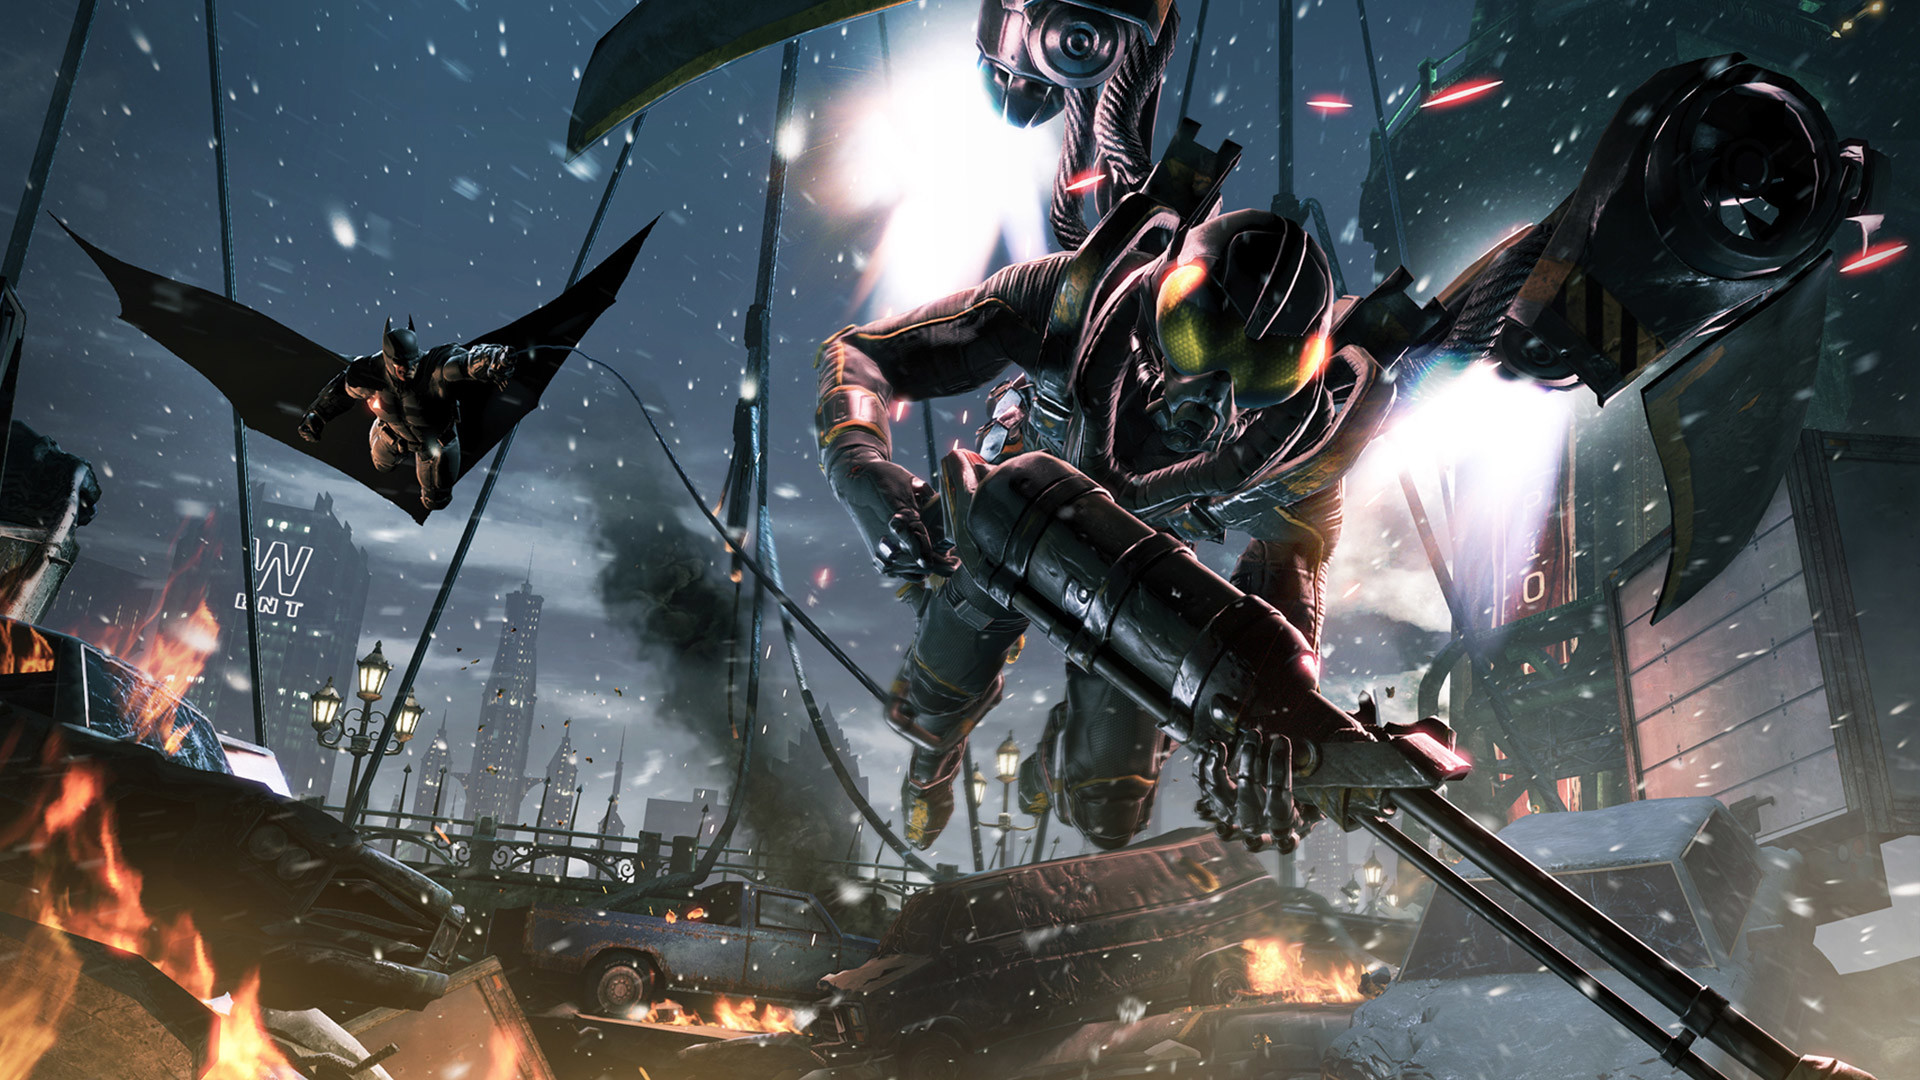 You are downloading Batman Arkham Origins wallpaper 8. download wallpaper